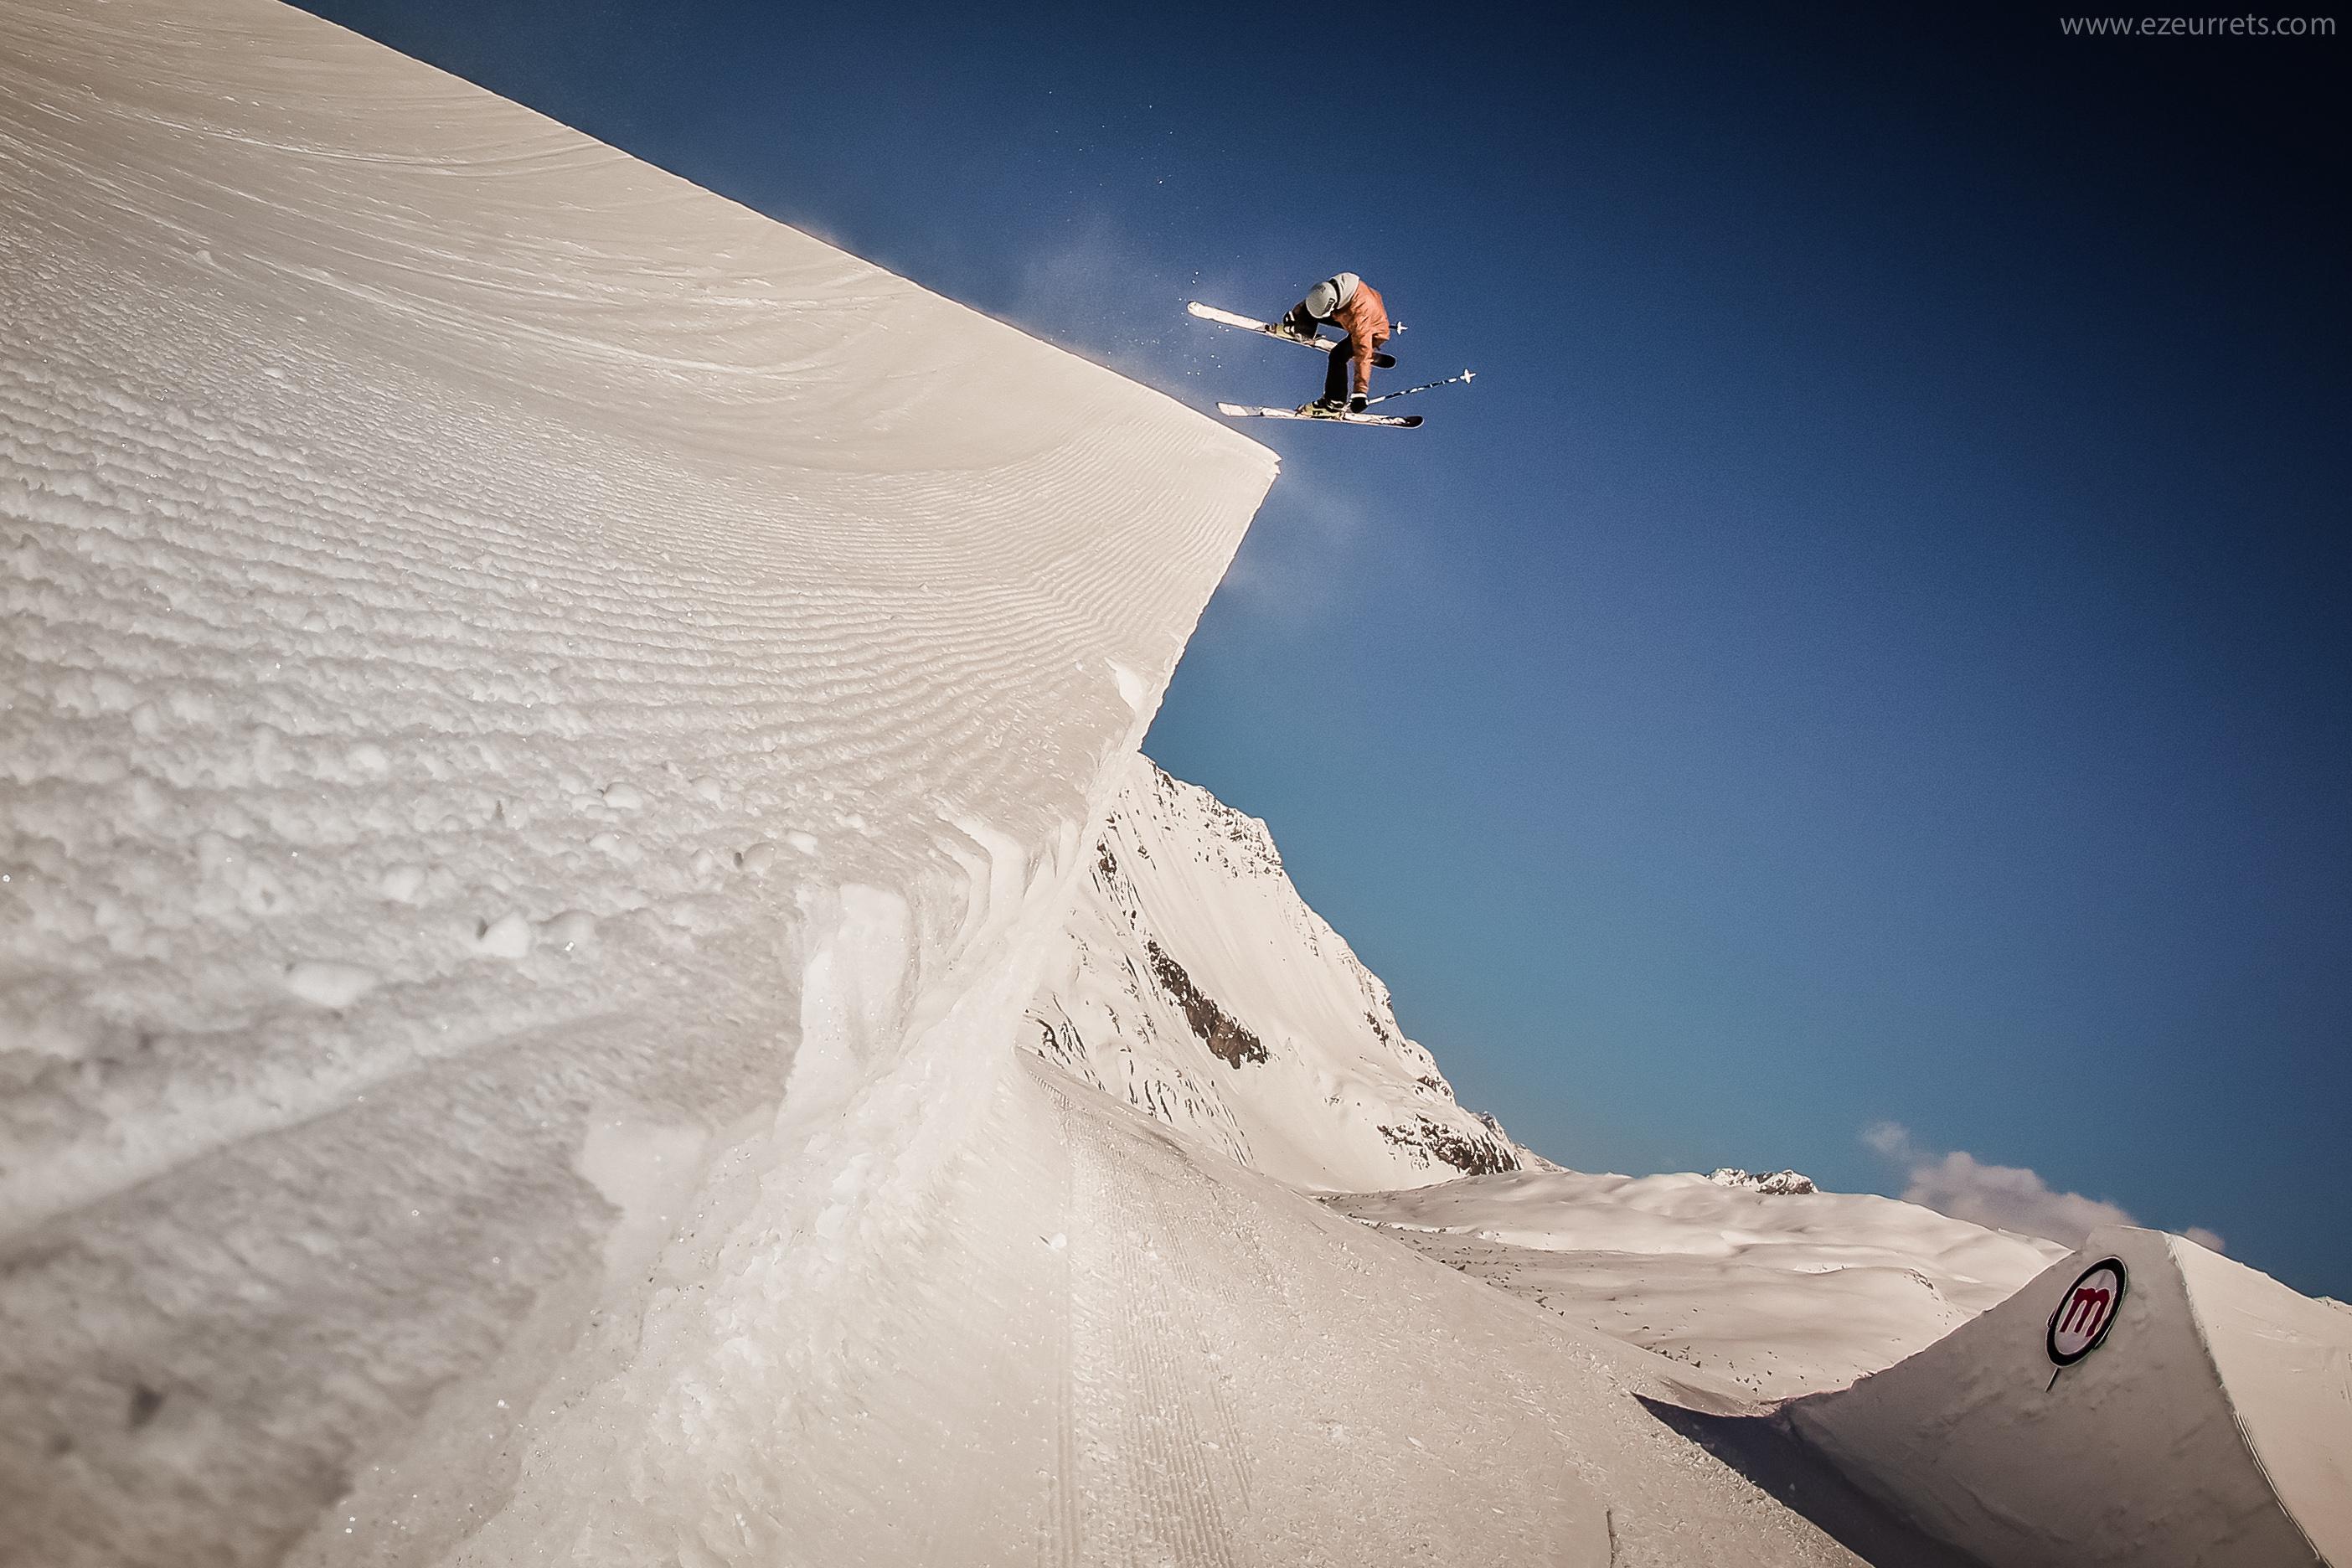 Sciatore sul Mottolino Snowpark